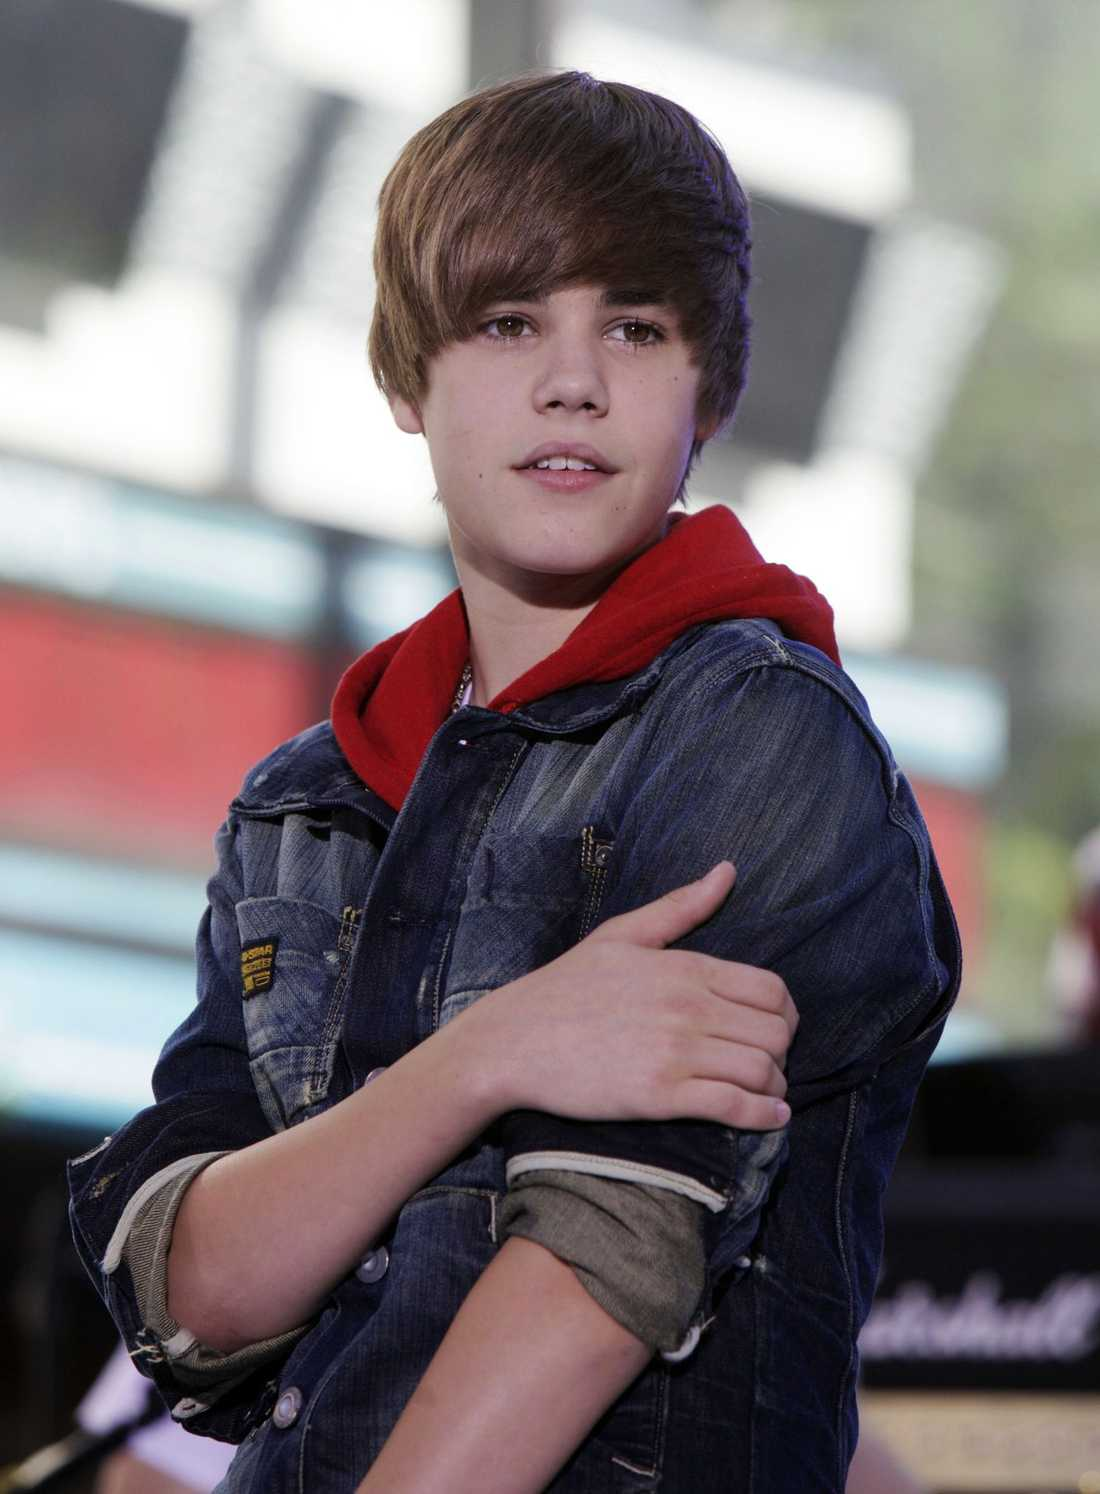 7. Justin Bieber.